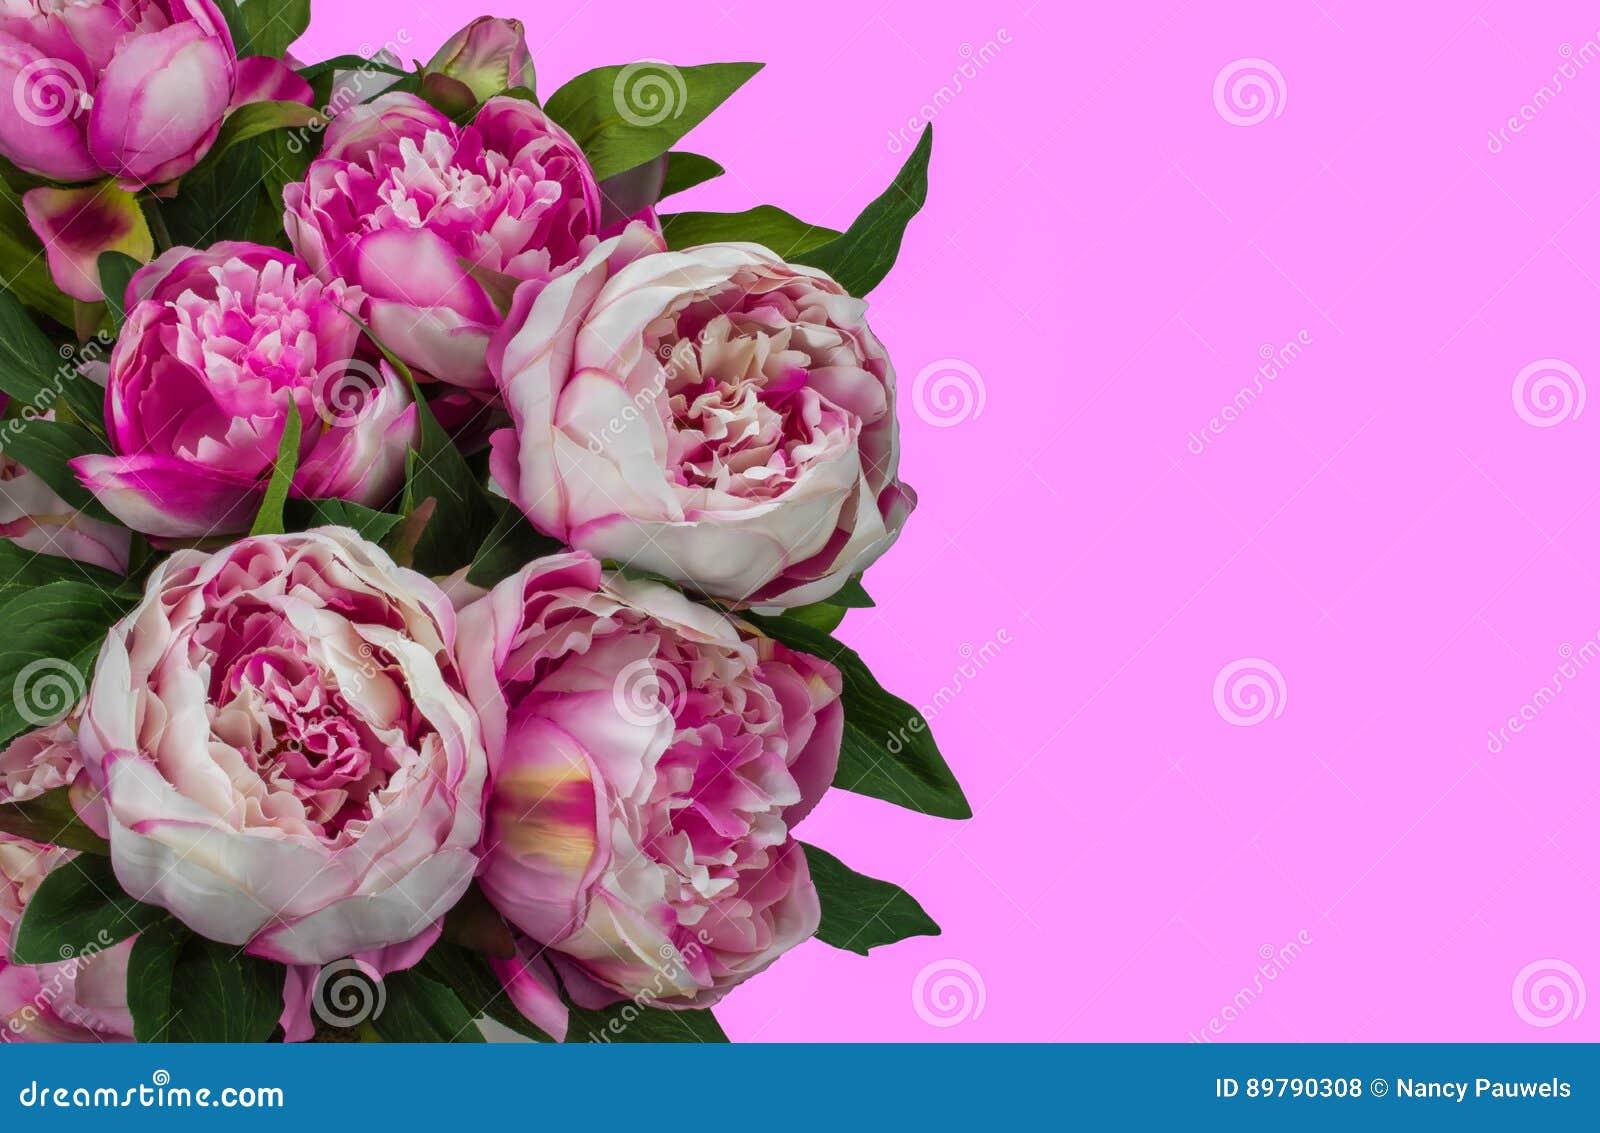 Pink Peony Flowers Stock Photo Image Of Bloom Peonies 89790308